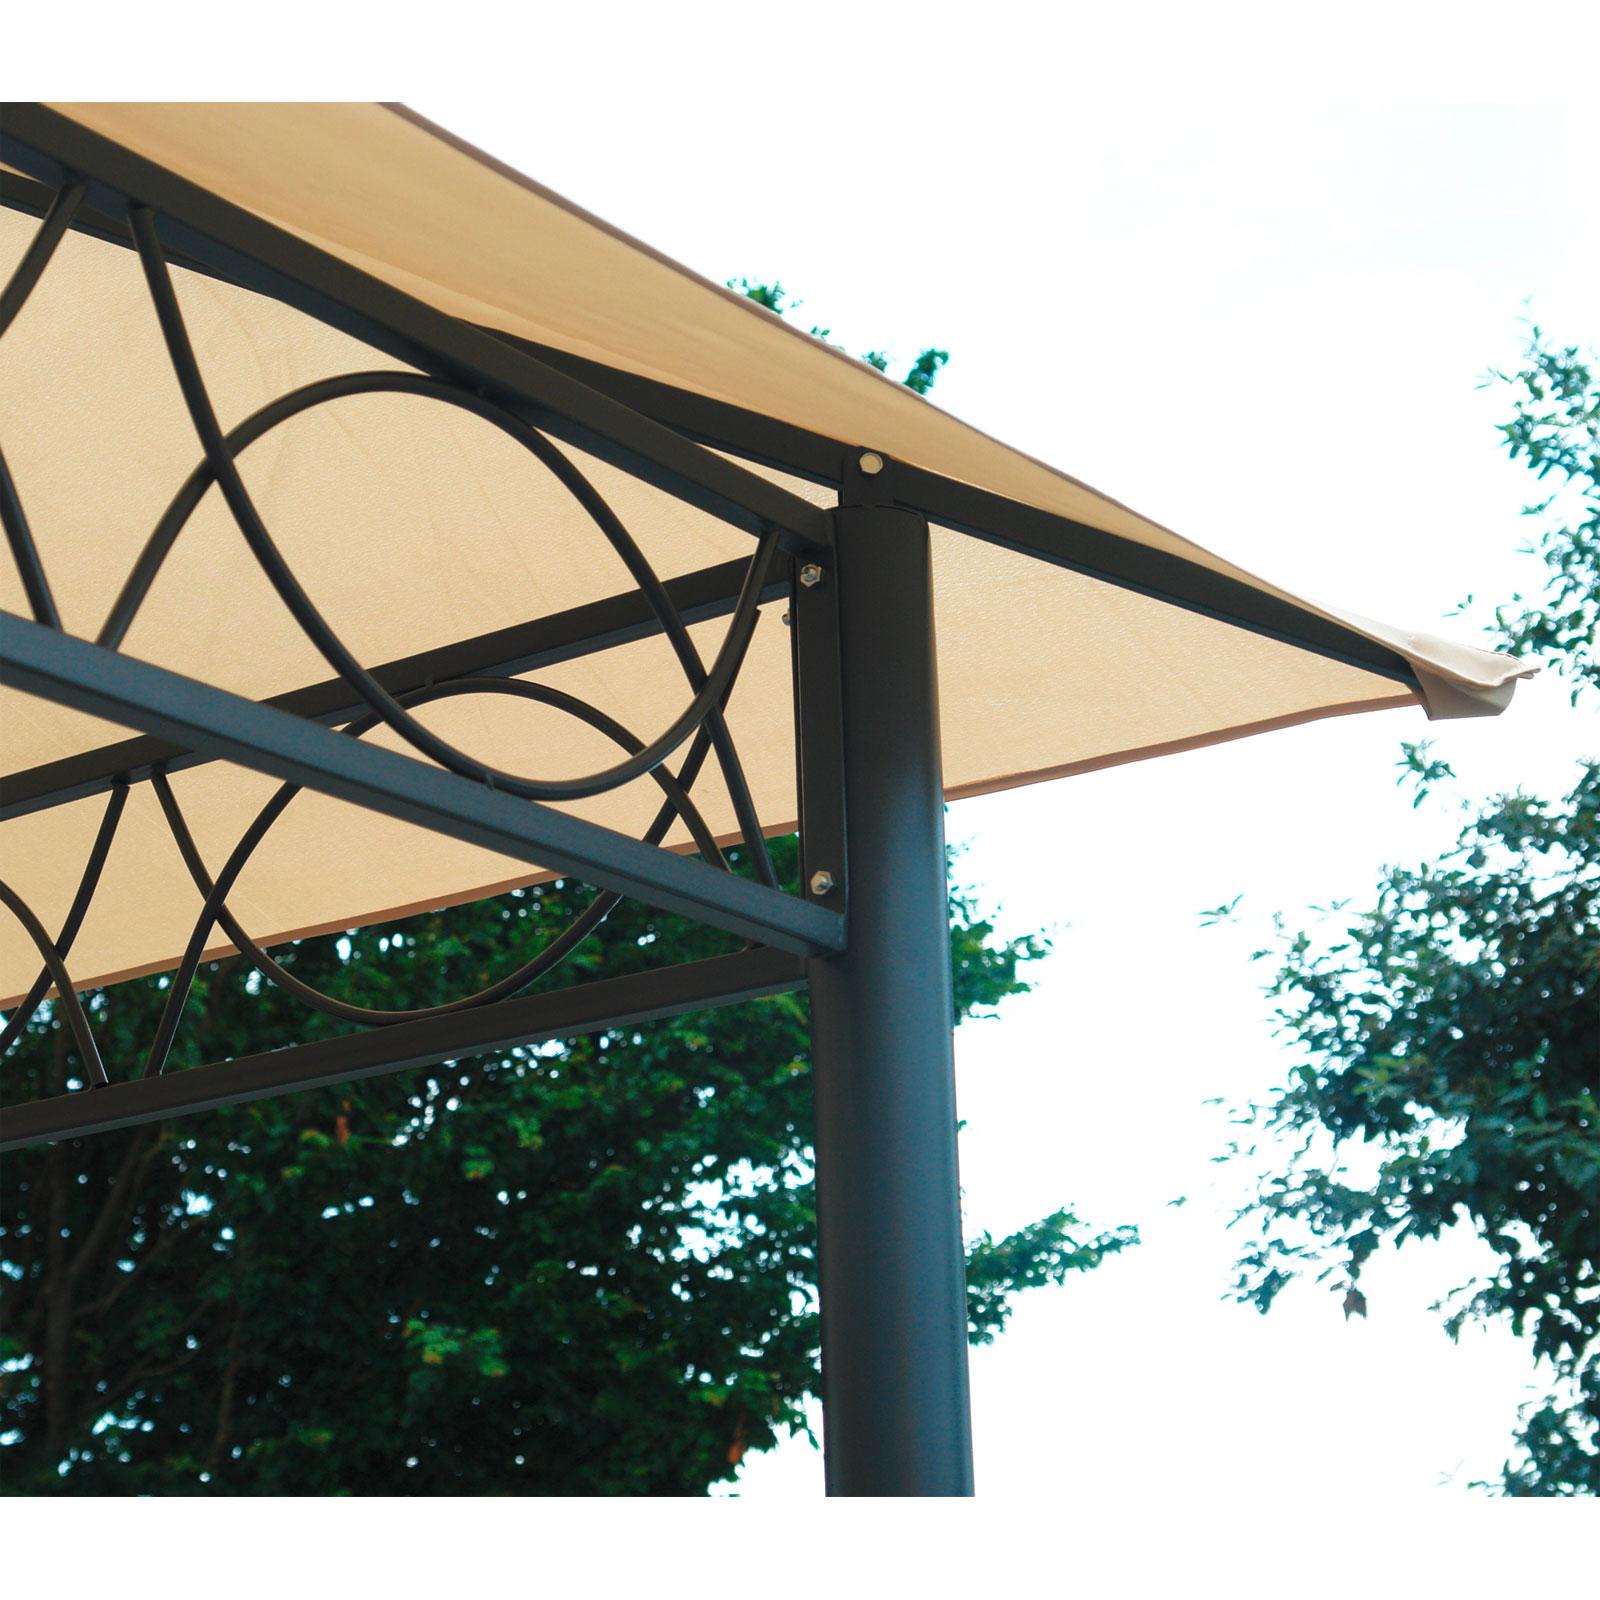 pavillon mit festem dach die. Black Bedroom Furniture Sets. Home Design Ideas